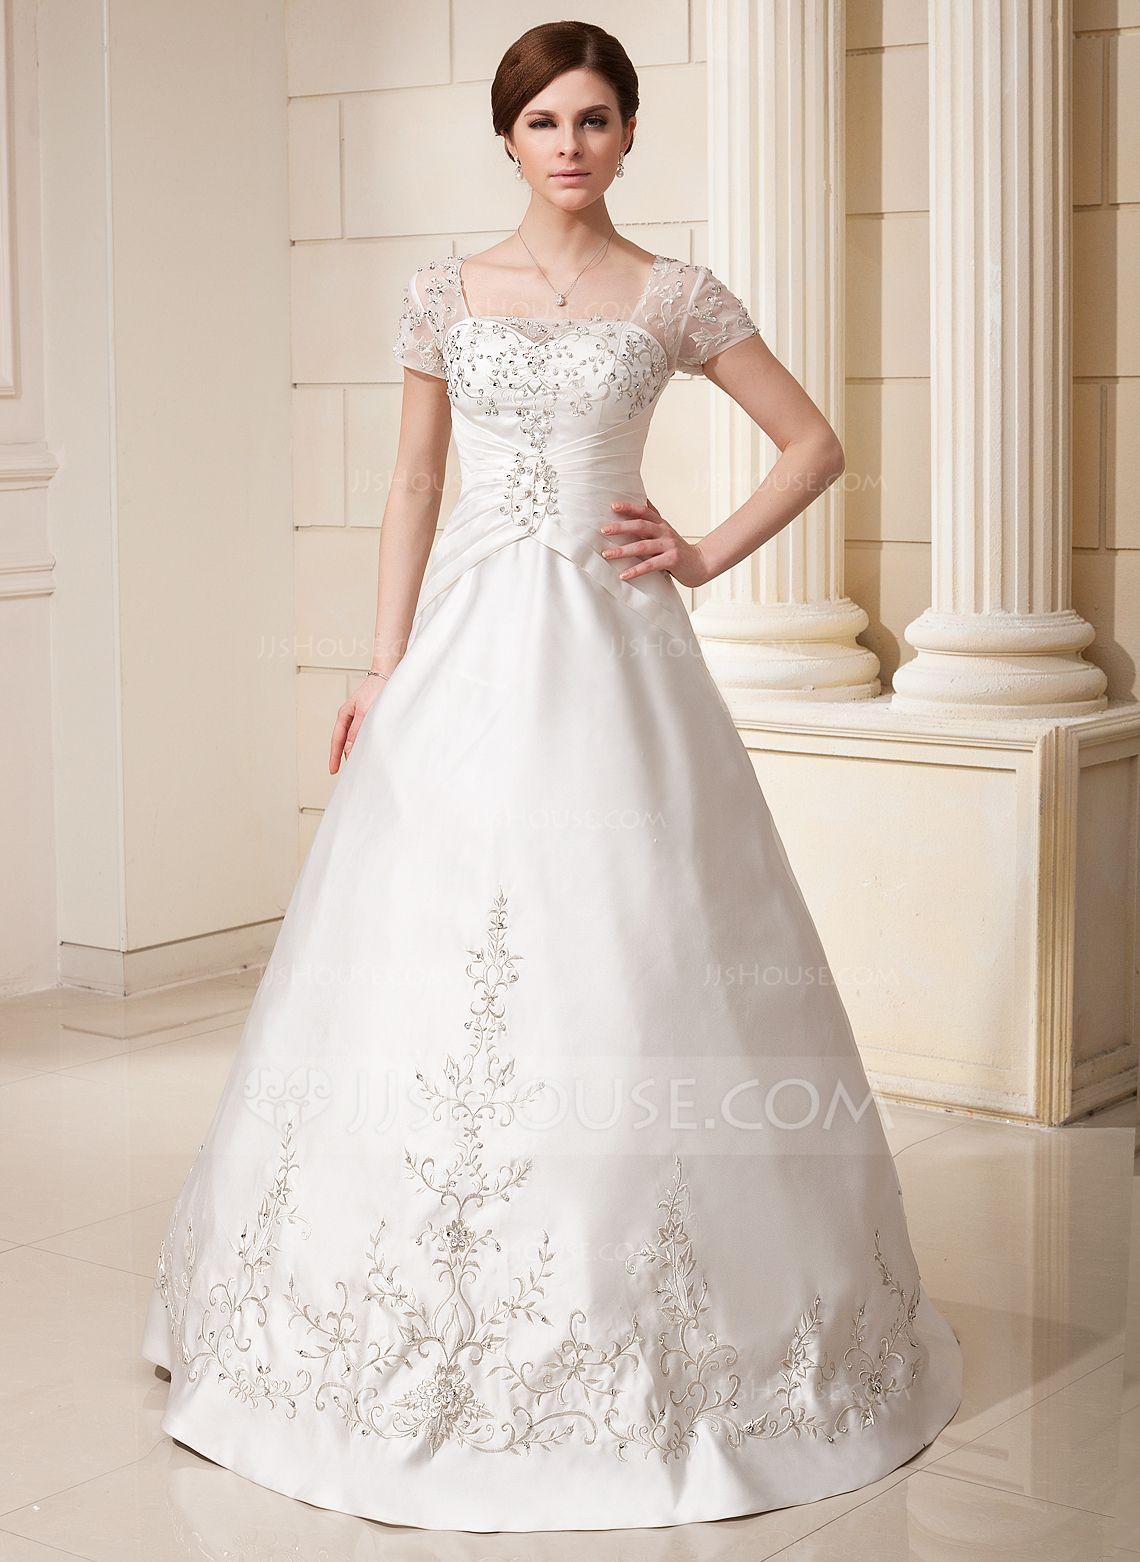 Alineprincess square neckline floorlength satin tulle wedding